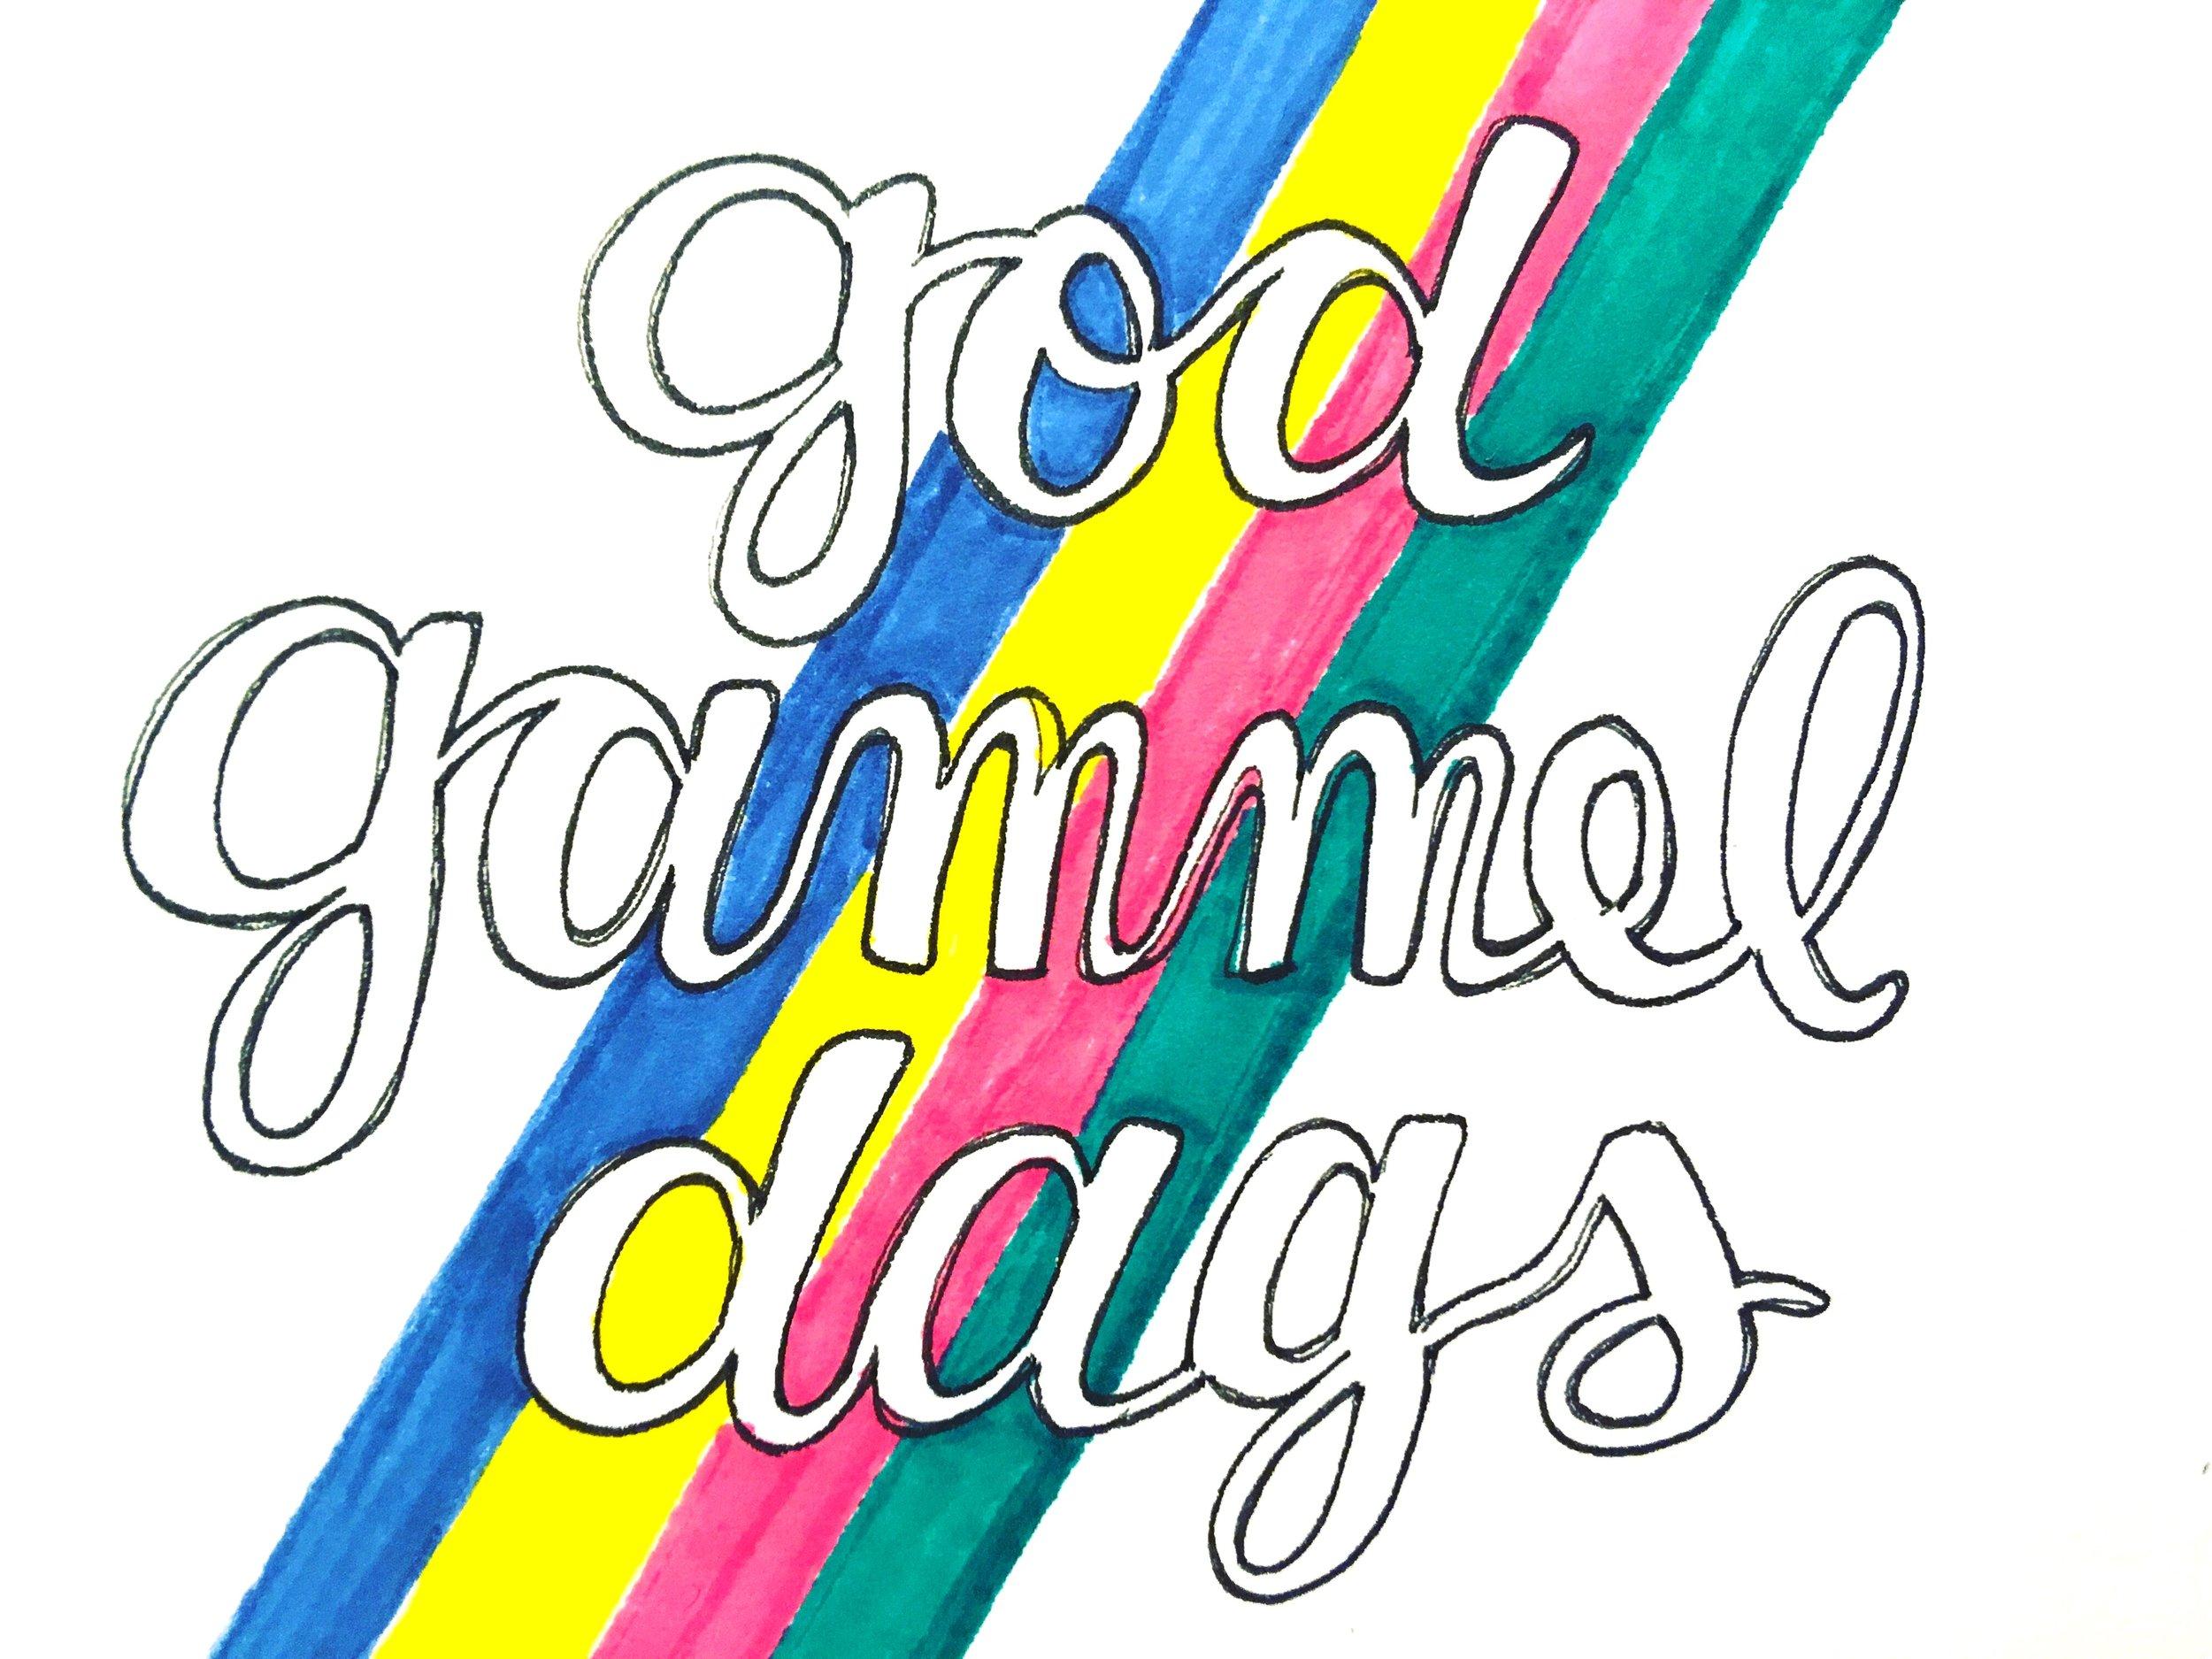 51_God Gammel Dags.JPG